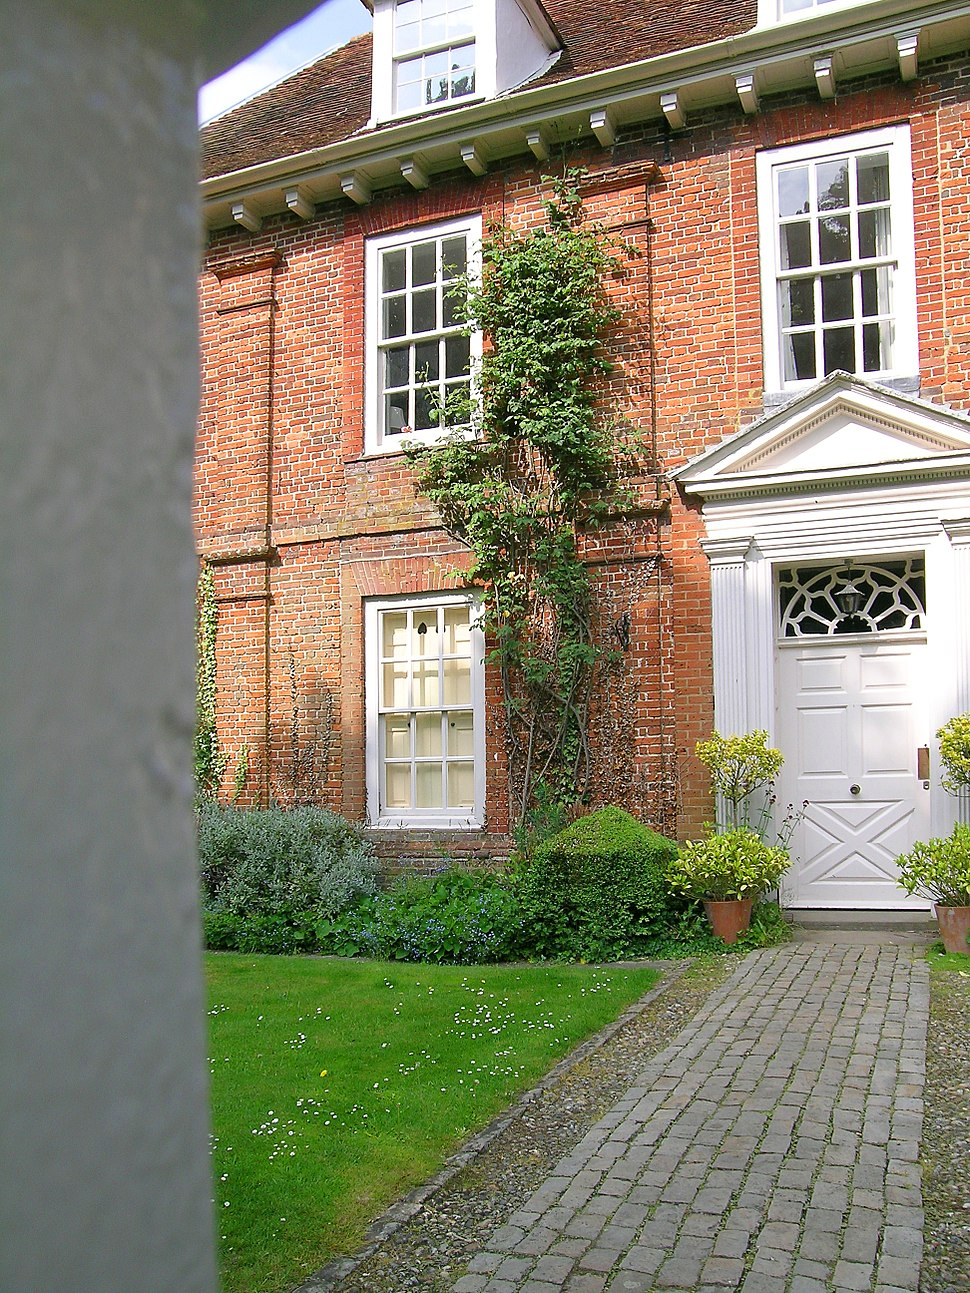 Manor House Princes Risborough Bucks Door & pilasters